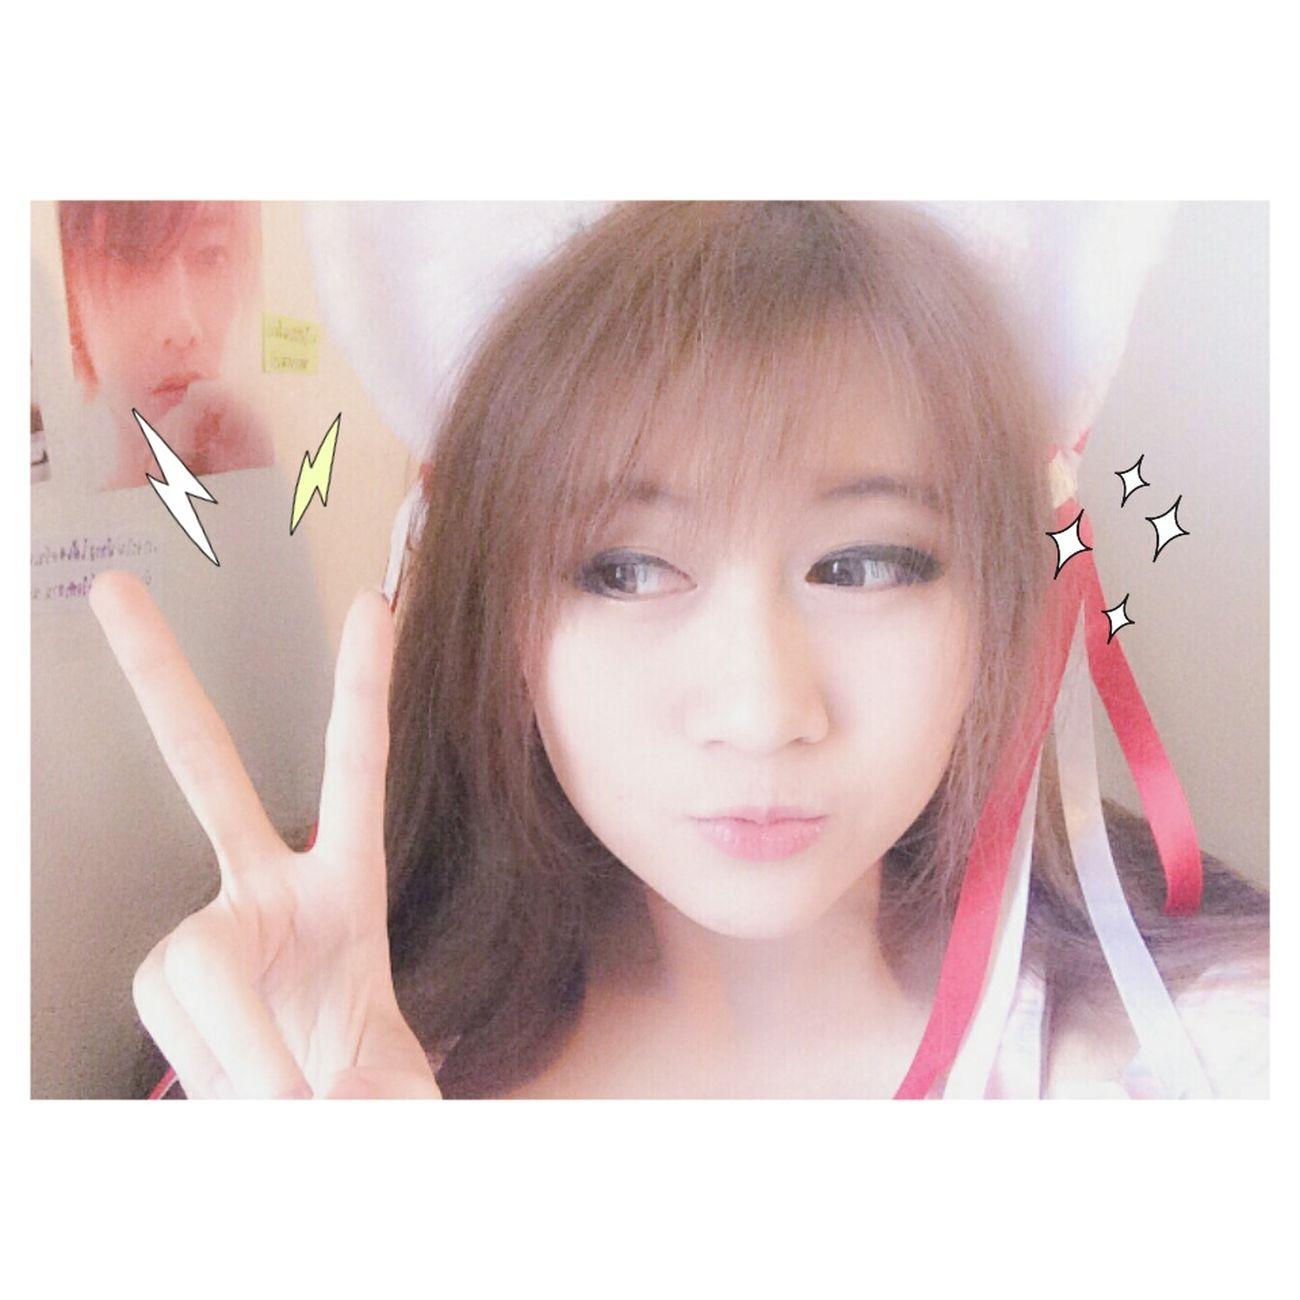 Miss me ..? LoL SatohTakeru TakeruSatoh Japangirl Pastel Pink Me Japanese  Followme Like Thailand